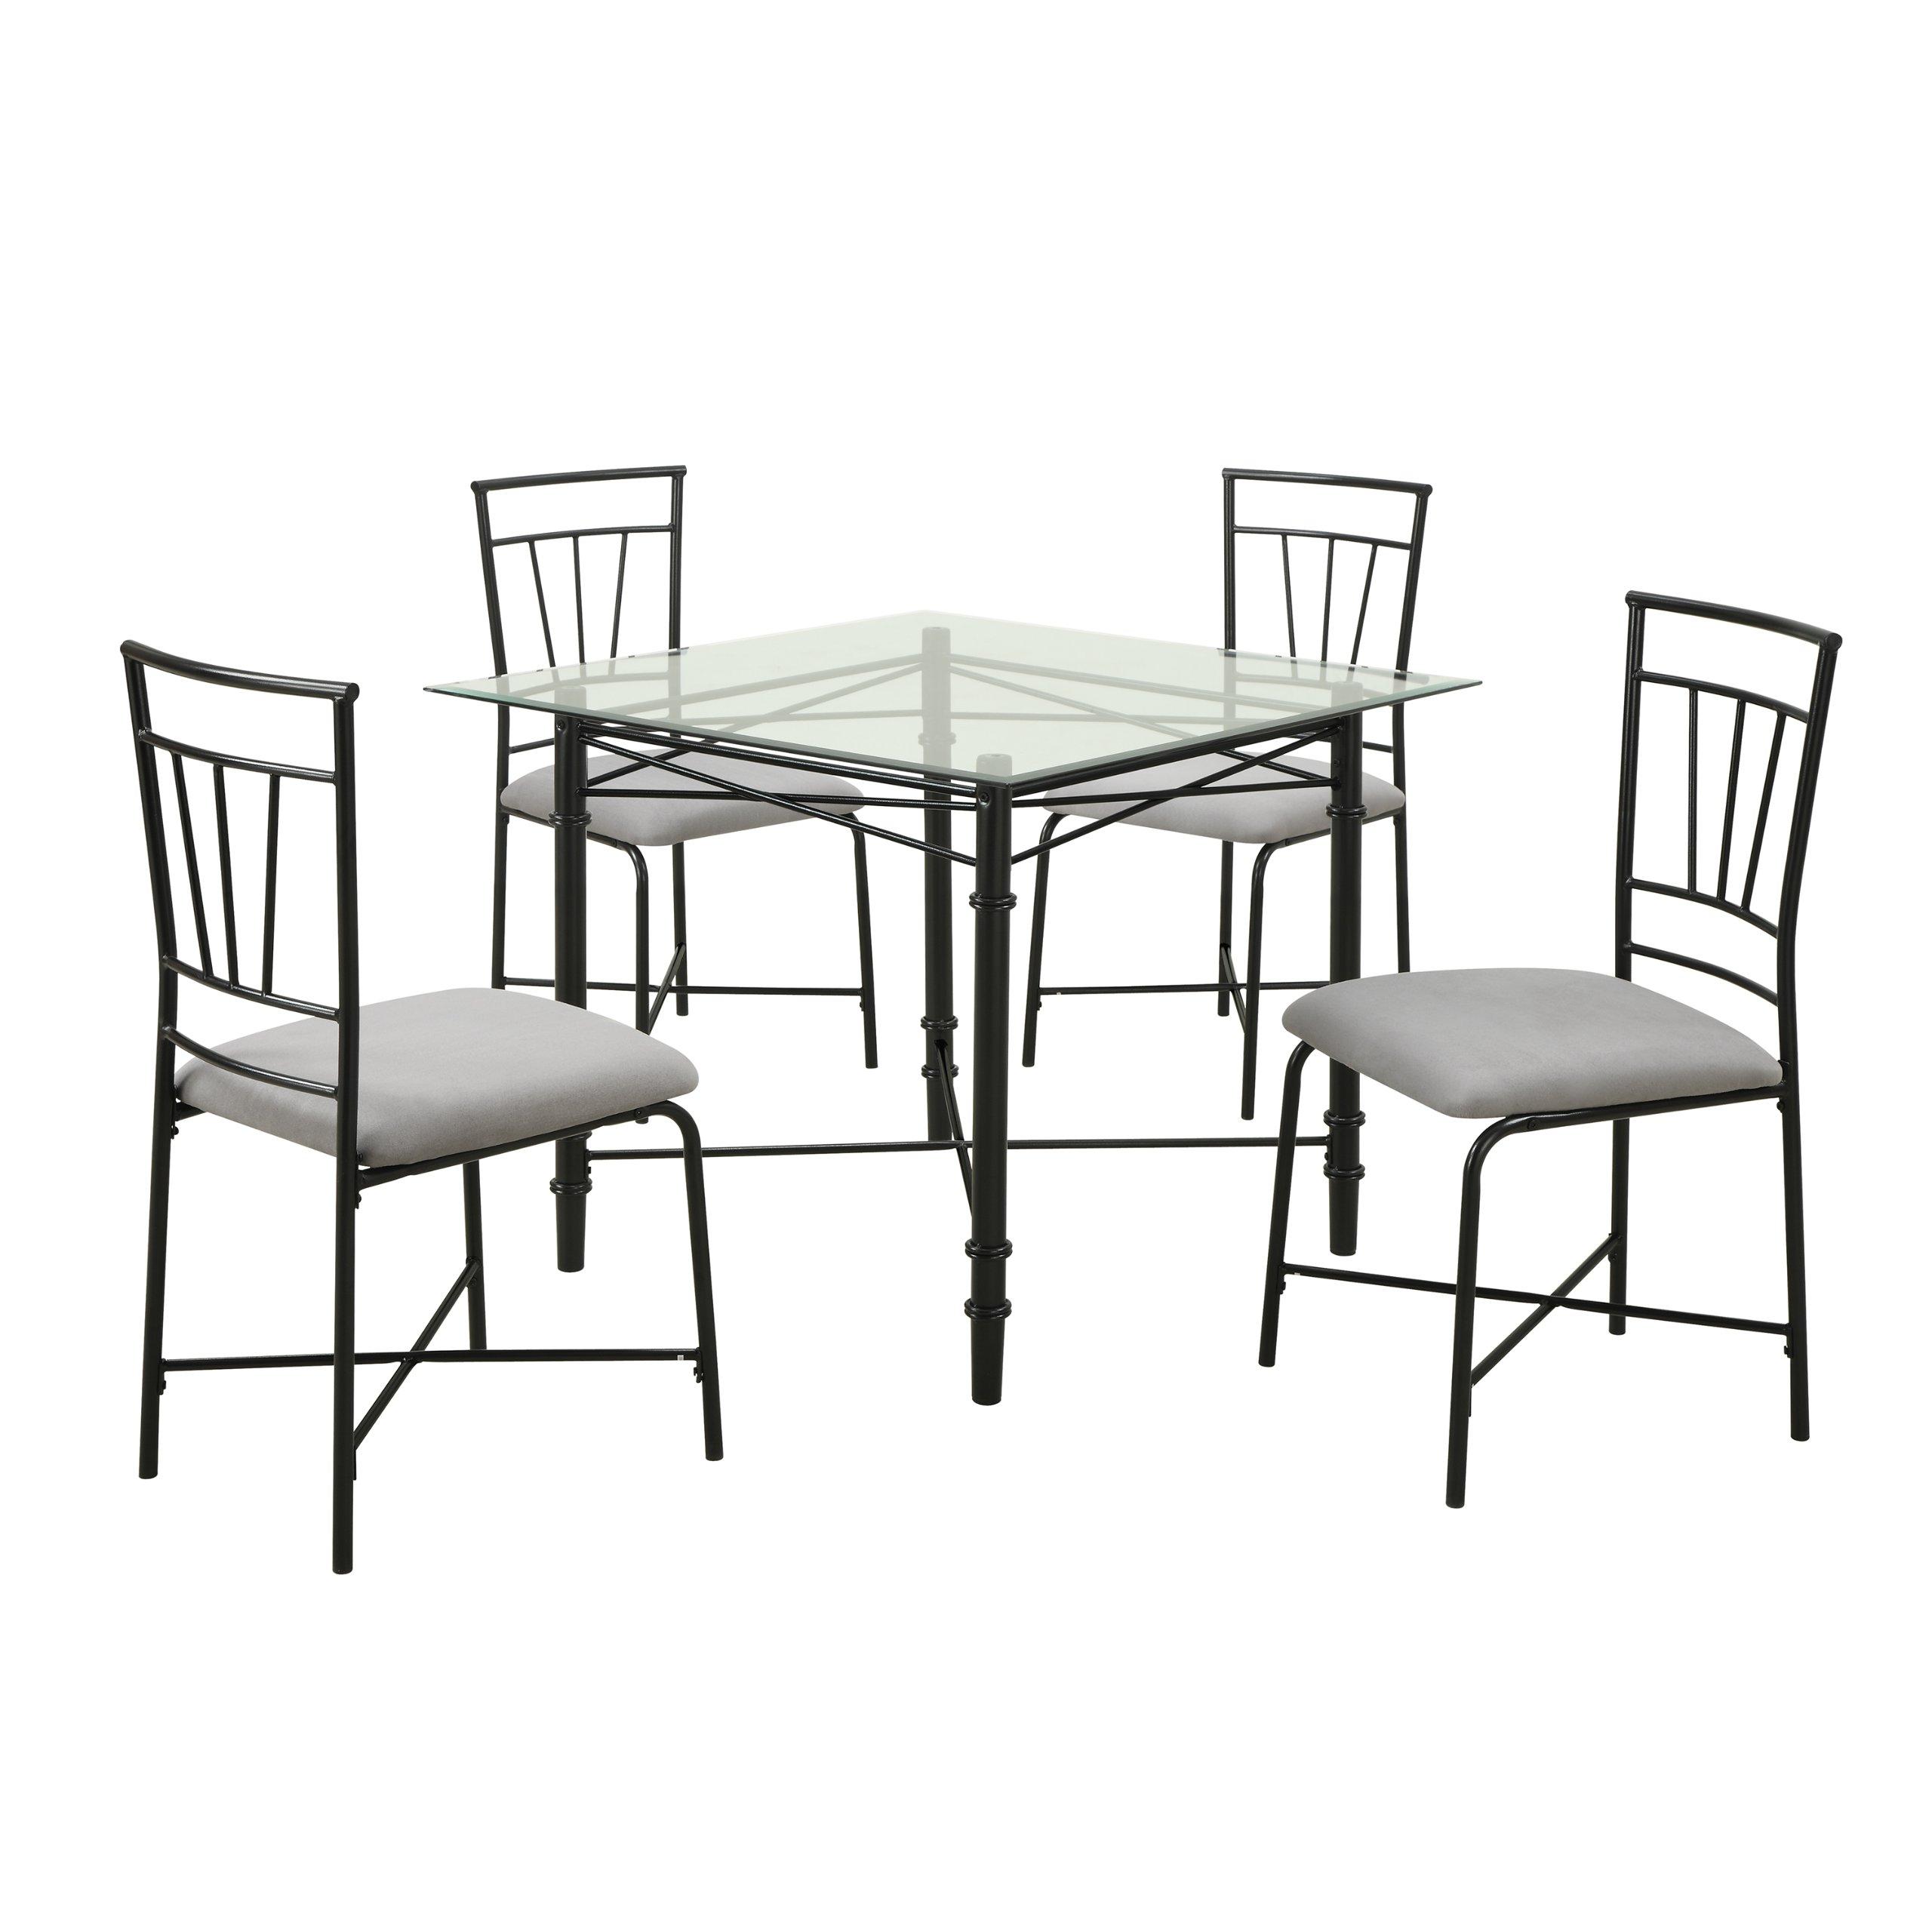 Dorel Living 5-Piece Glass Top Metal Dining Set